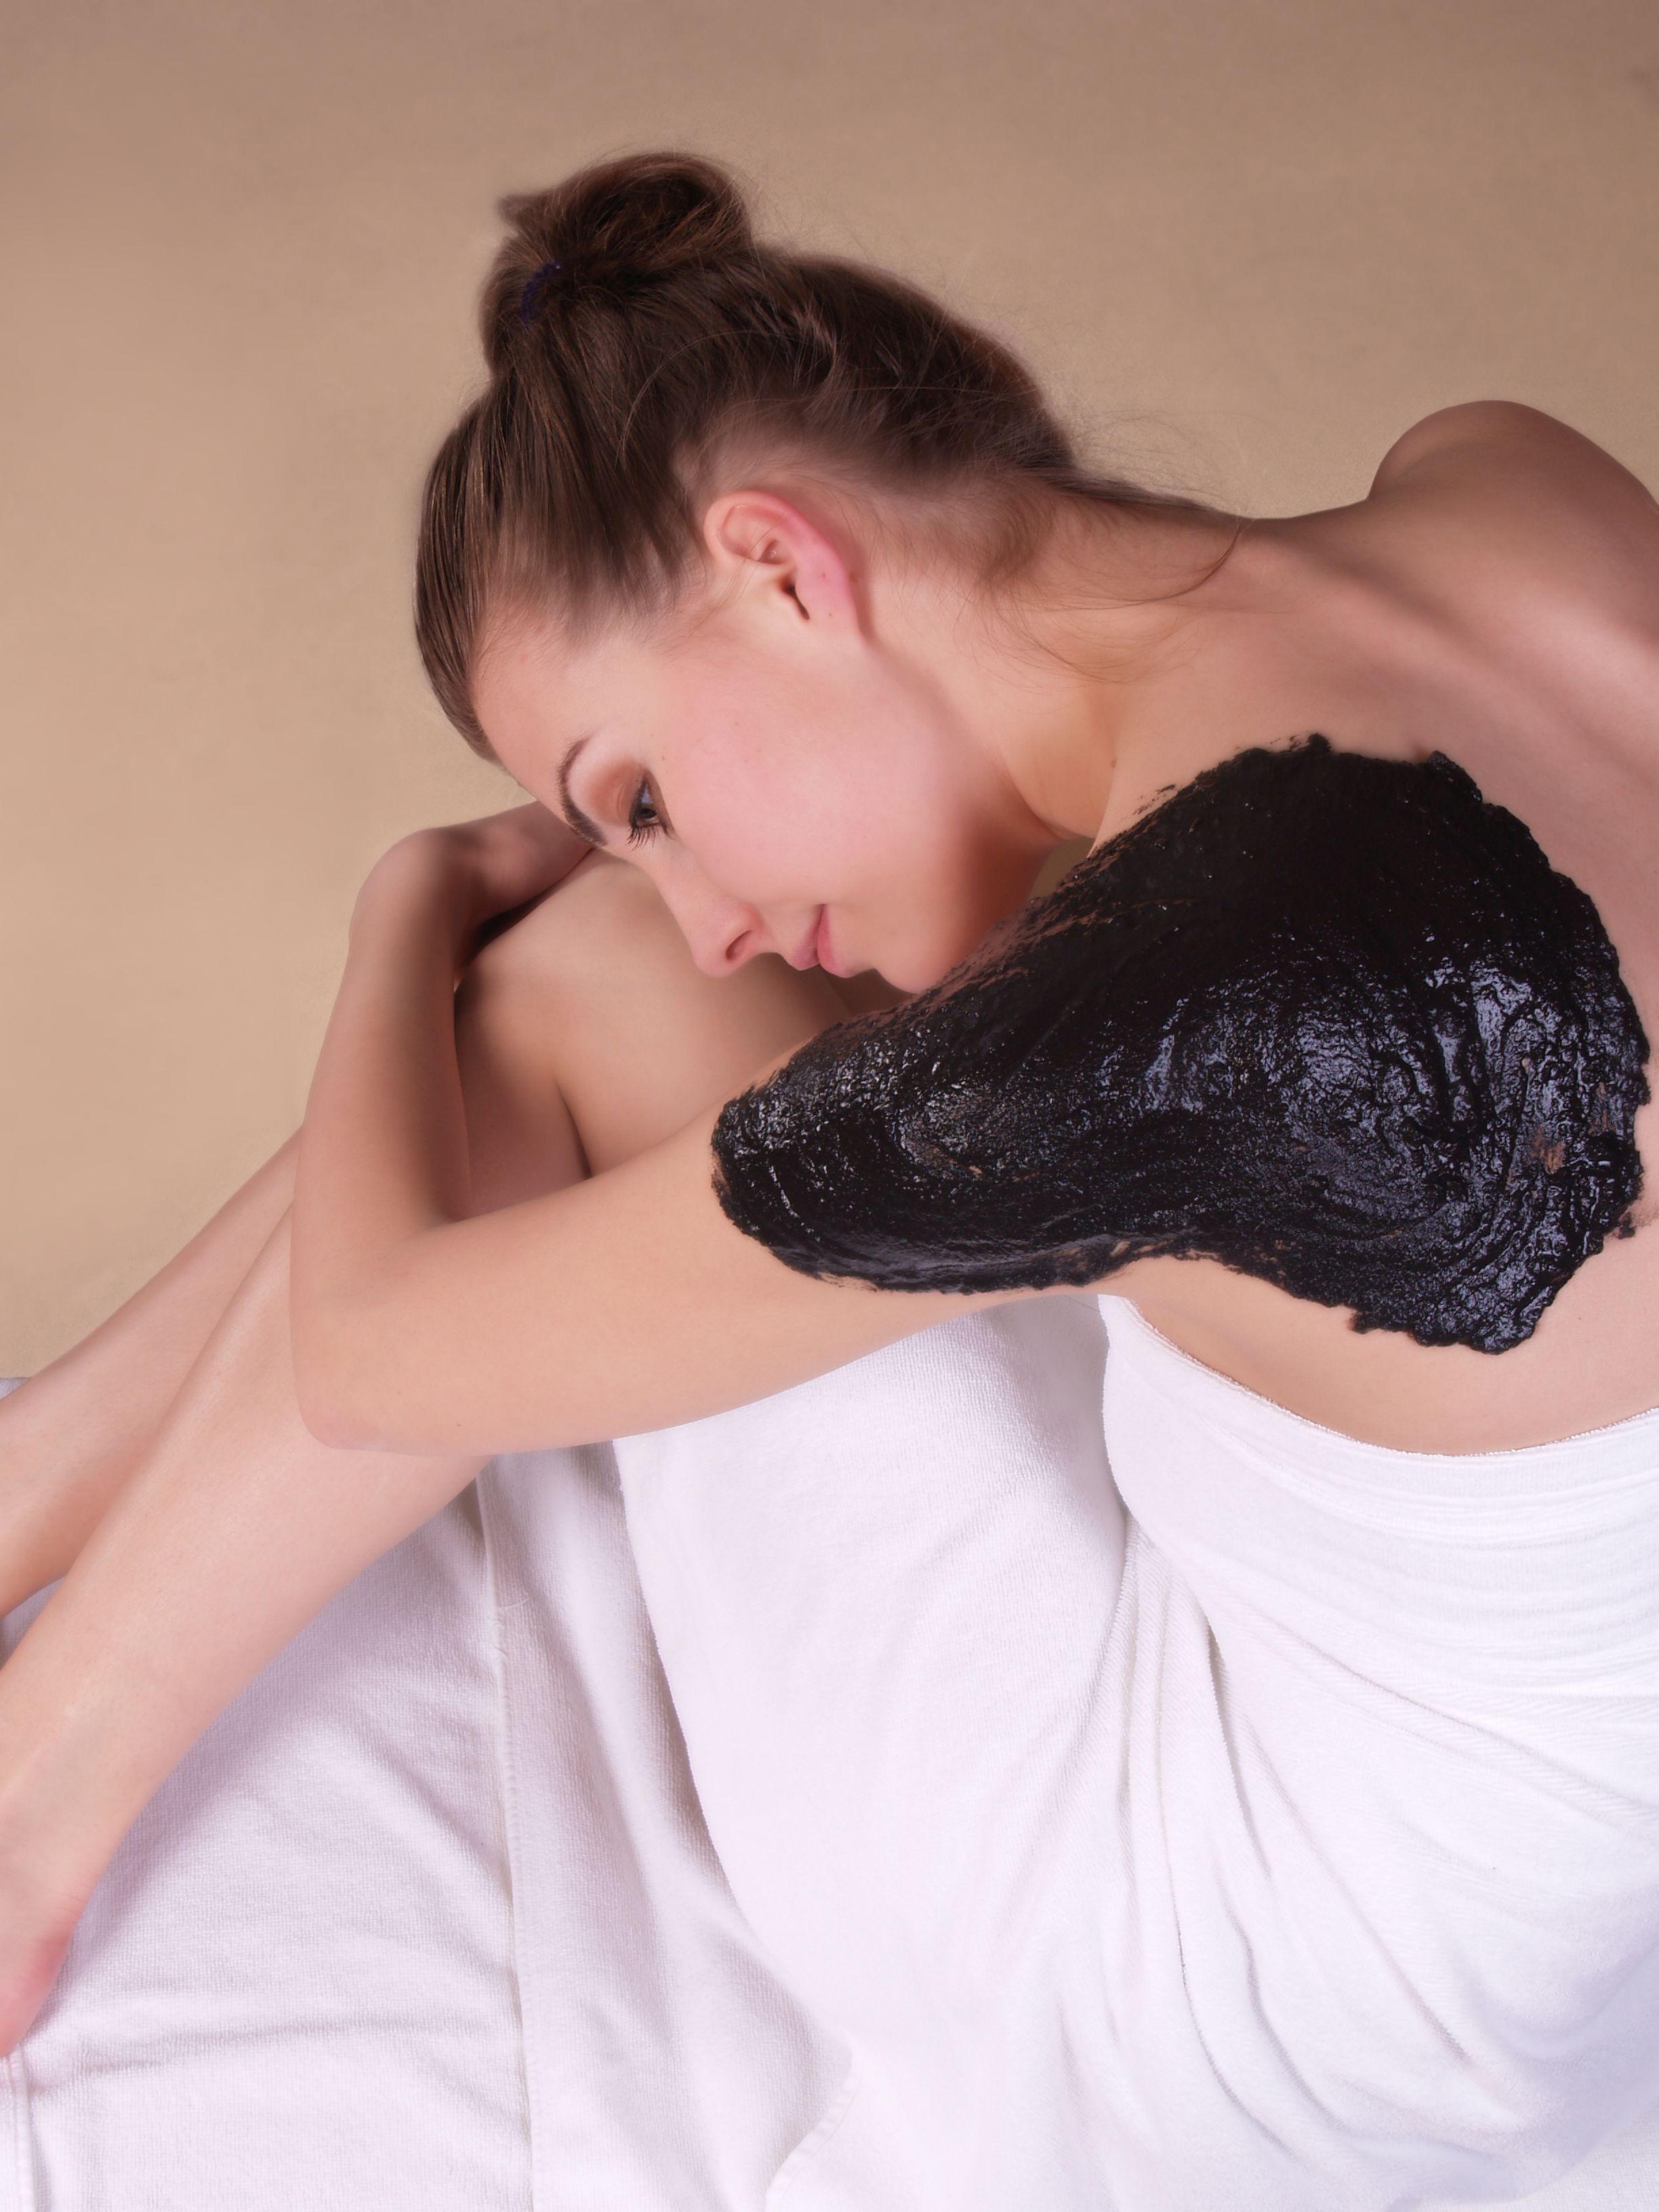 dureri severe la genunchi în repaus